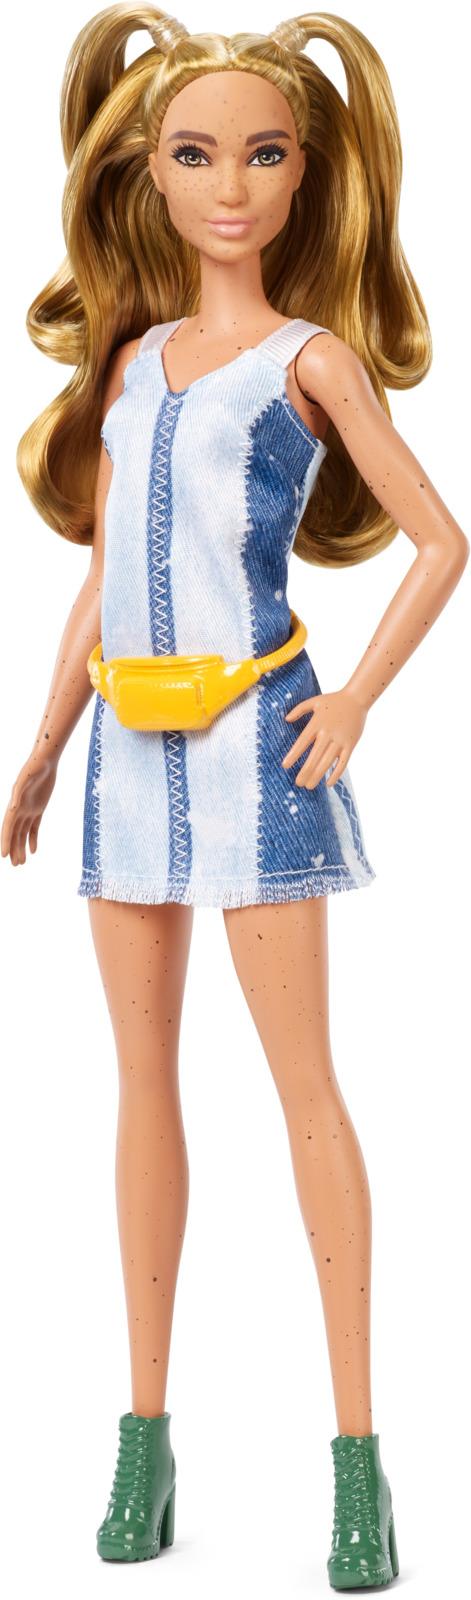 Barbie Кукла Fashionistas № 108_FBR37_FXL48 кукла barbie fashionistas 61